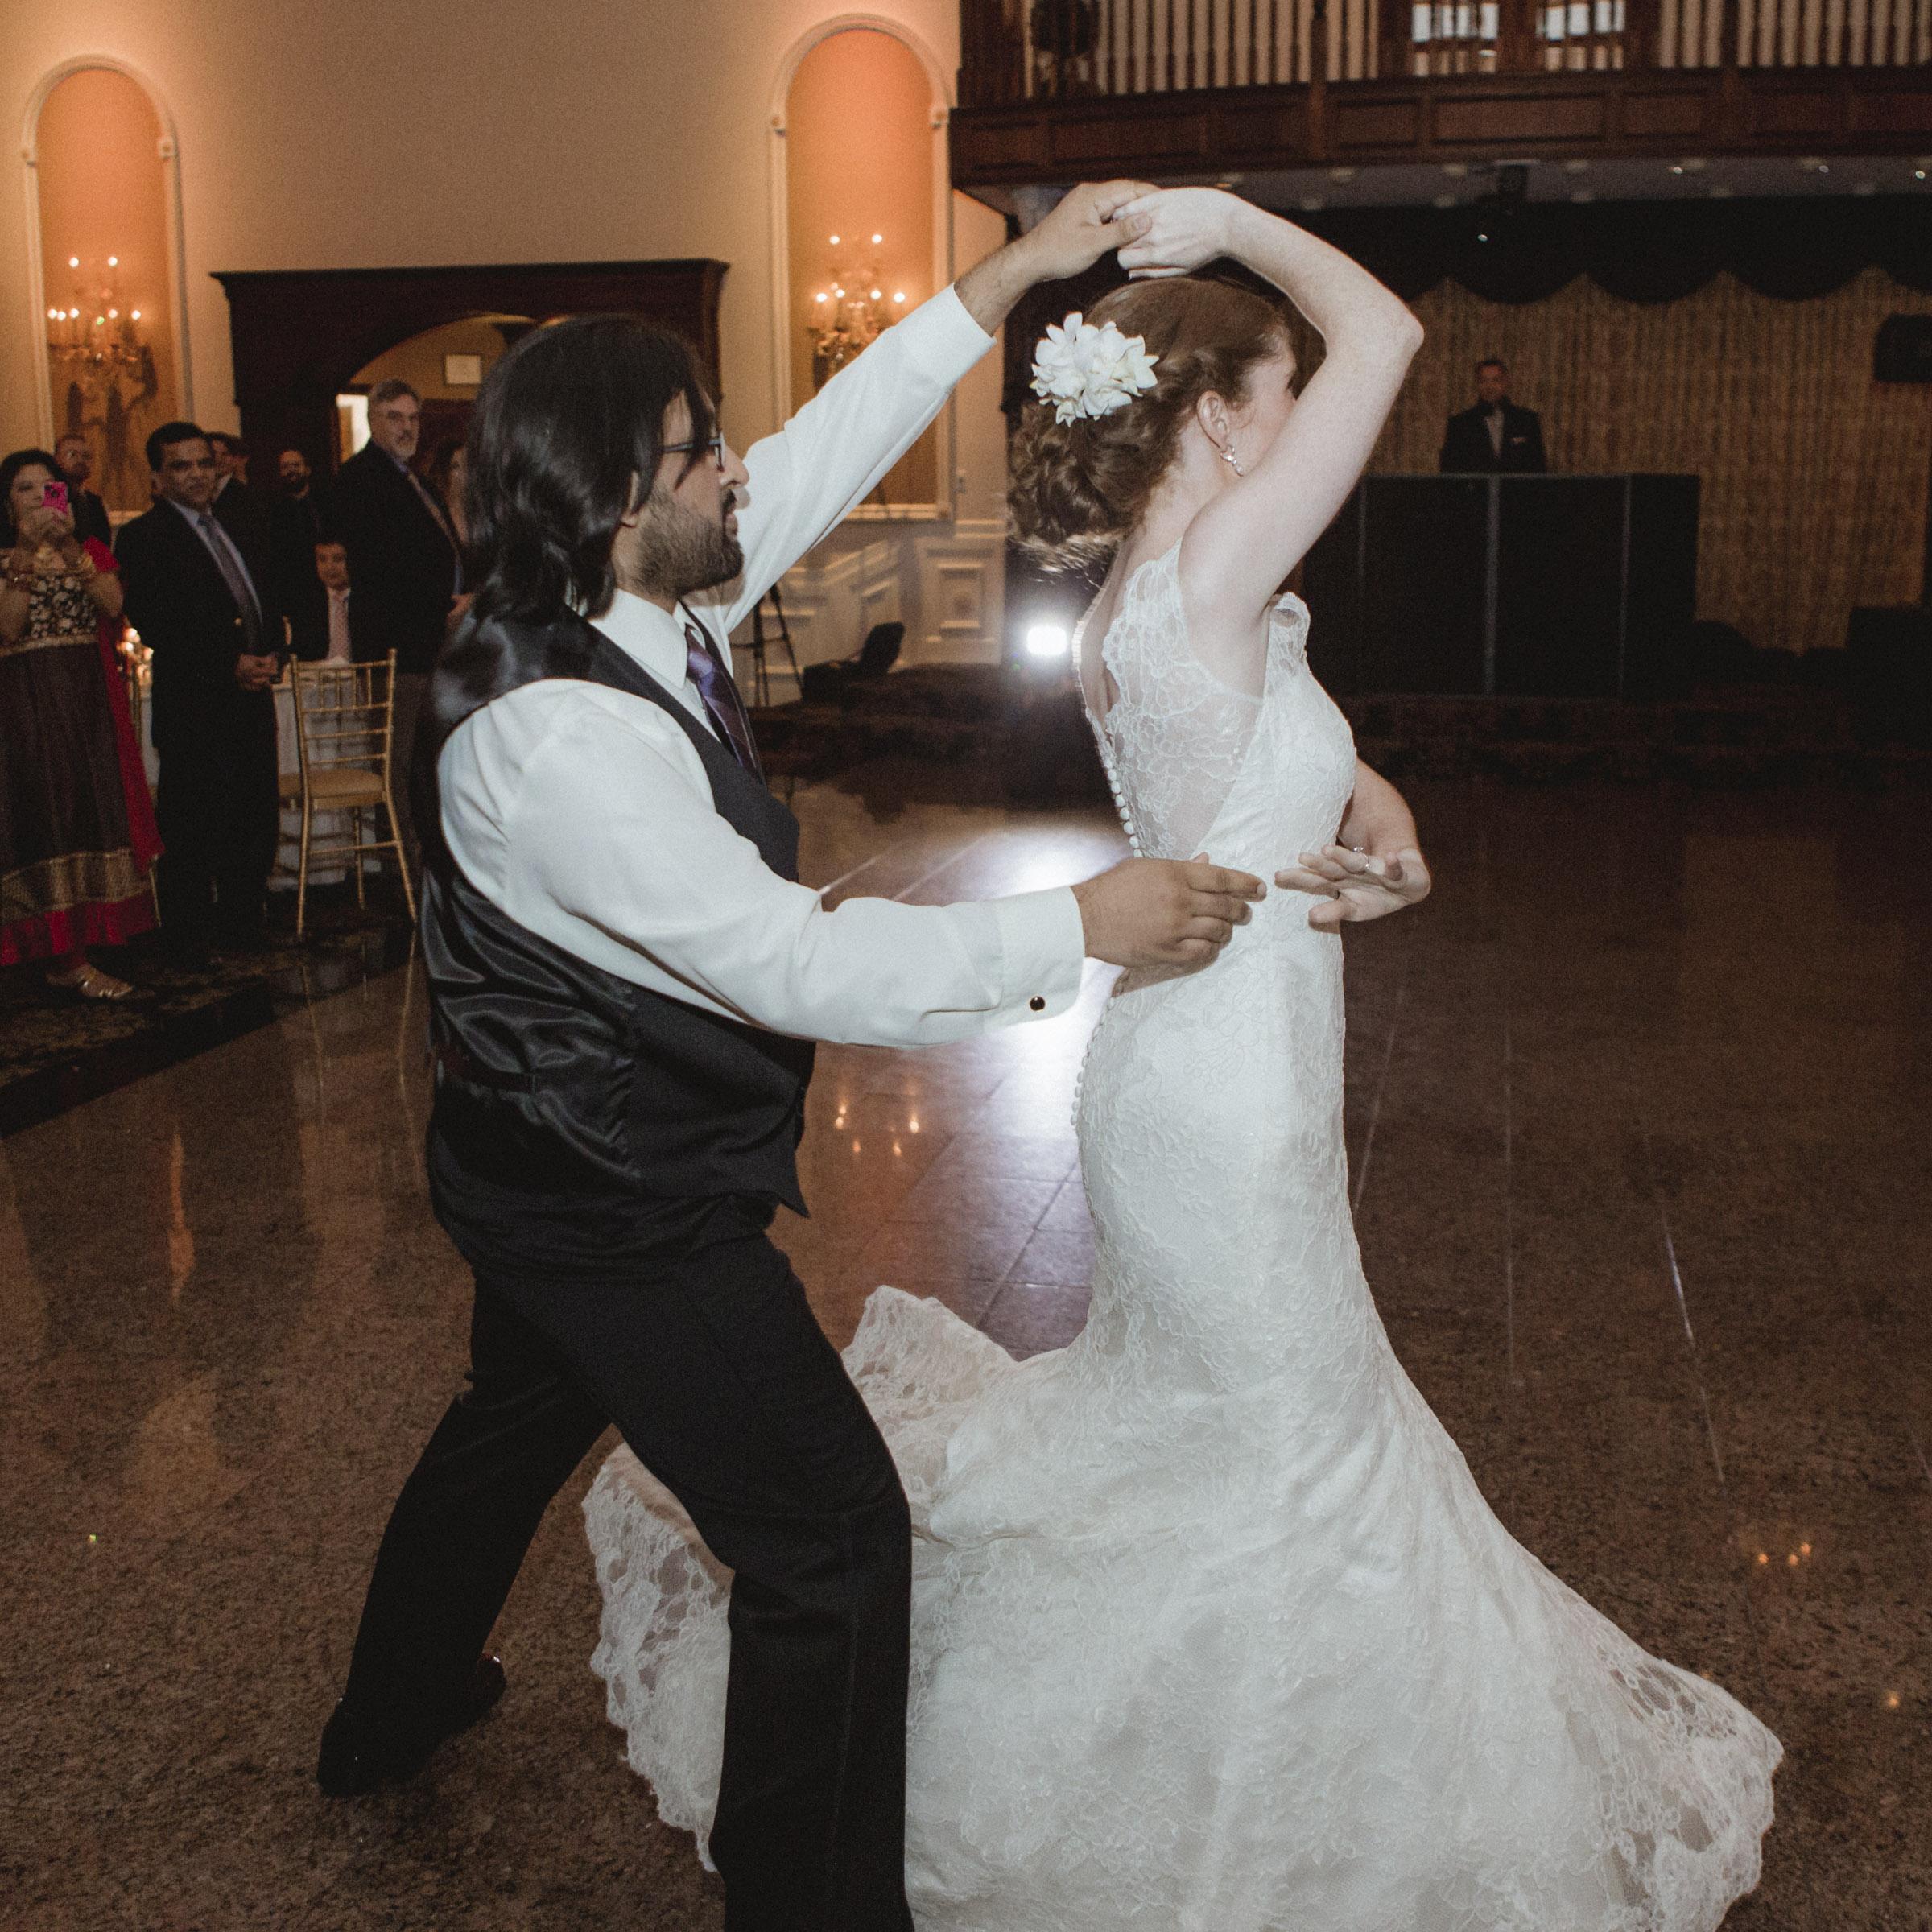 Groom twirls bride during their first dance - Estate at Florentine Gardens wedding - Hudson Valley Wedding - Kelsey & Anish's wedding - Amy Sims Photography